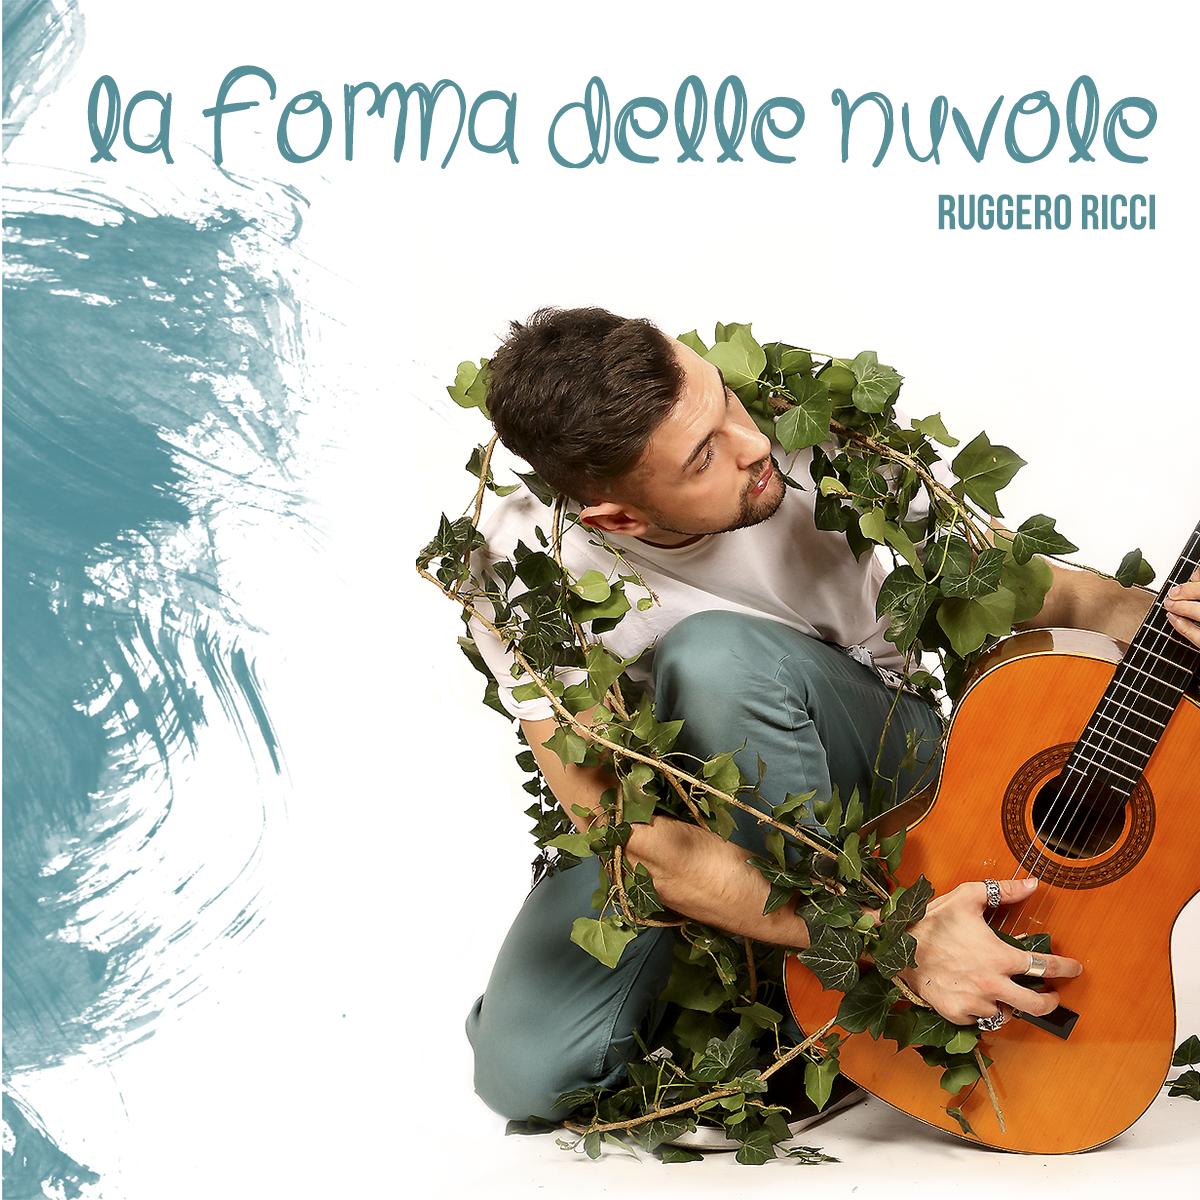 Ruggero Ricci